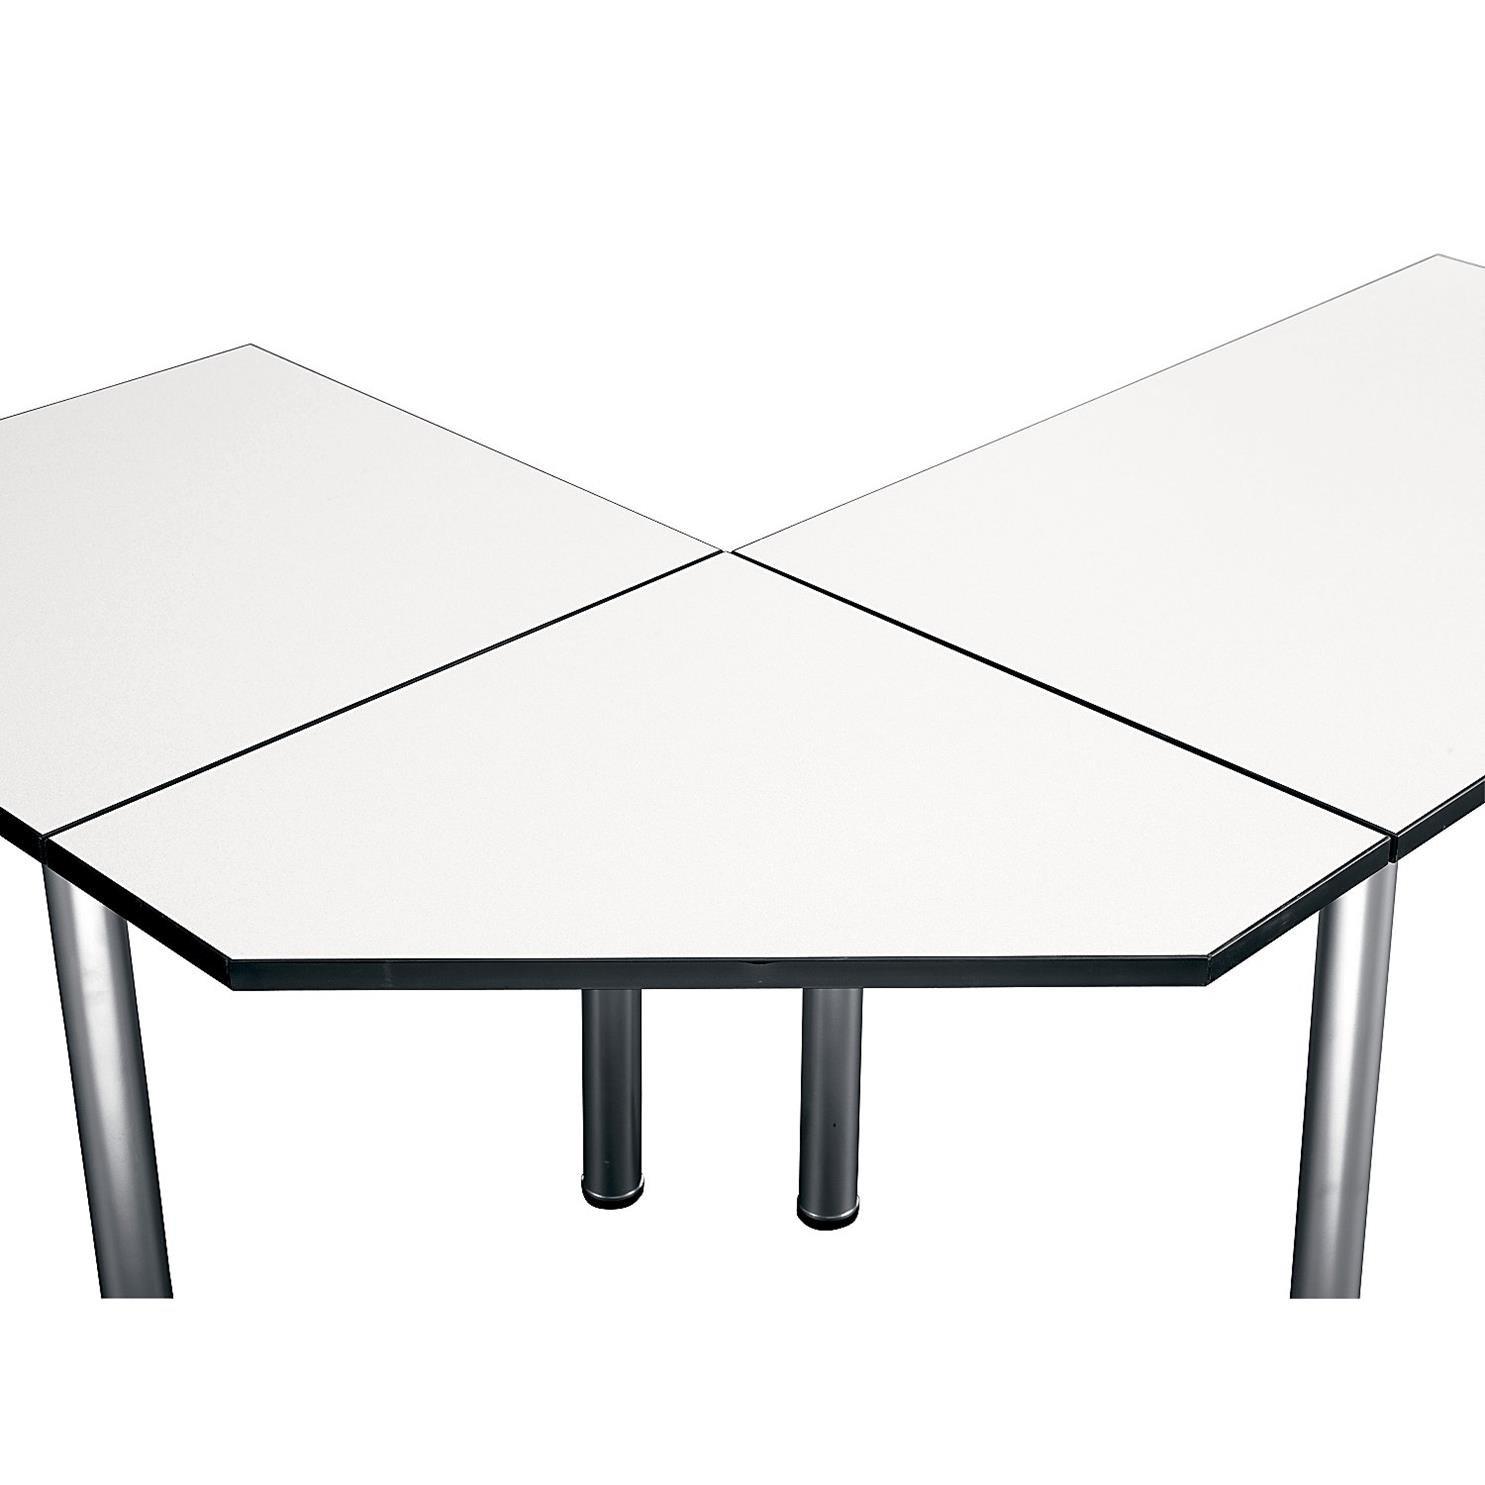 Bush Business Furniture Aspen Tables 28-1/2W Corner Connector in White Spectrum